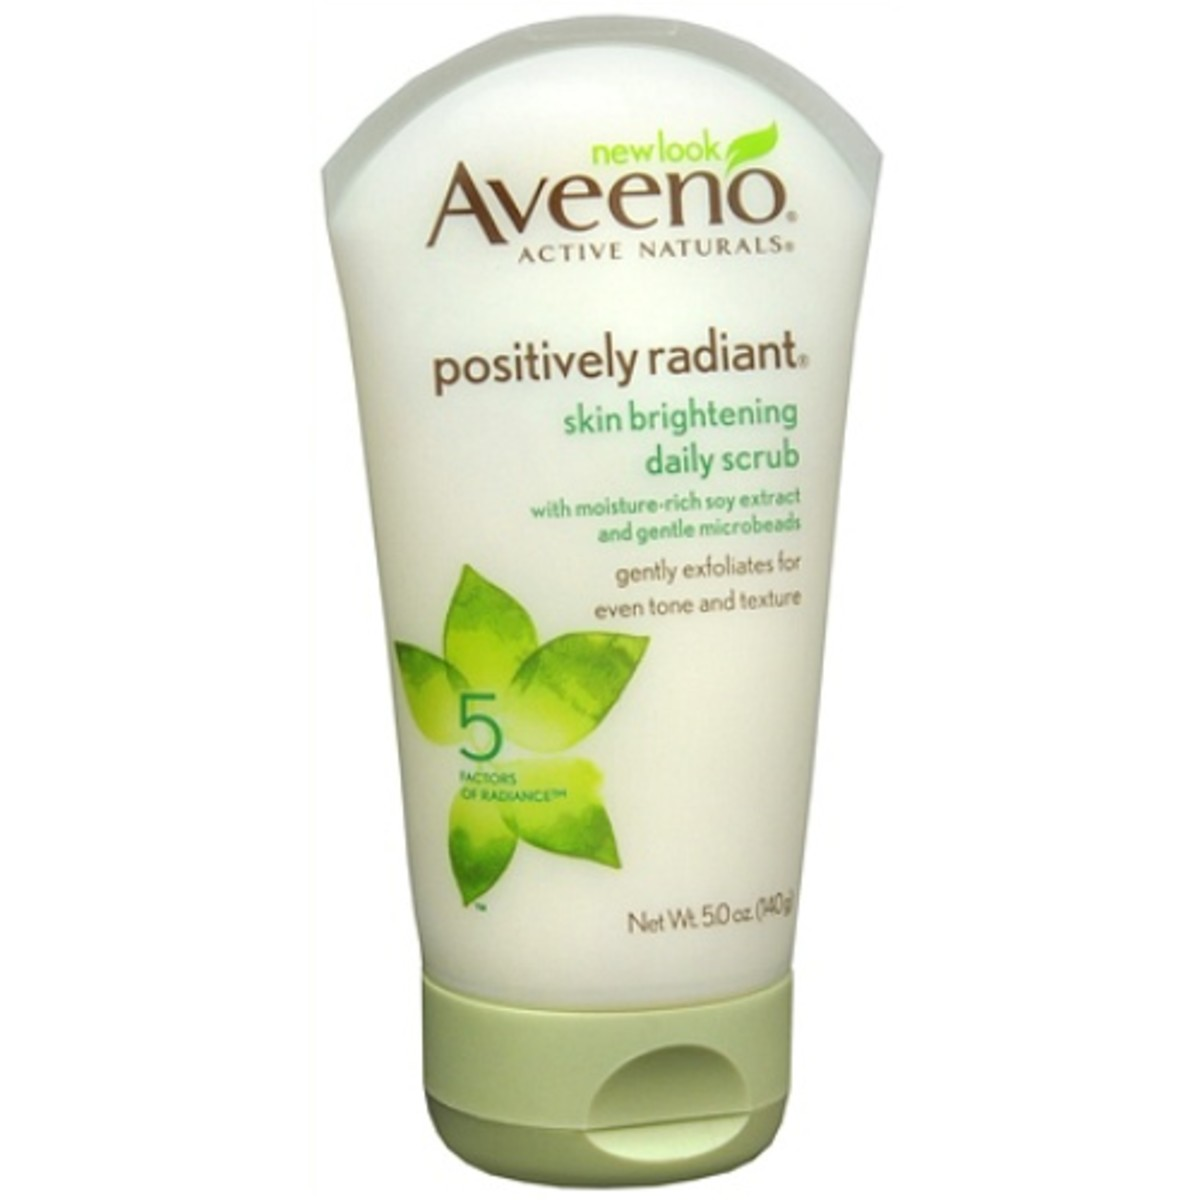 Aveeno 5 Daily Positively Scrub Skin Ounce Radiant Brightening